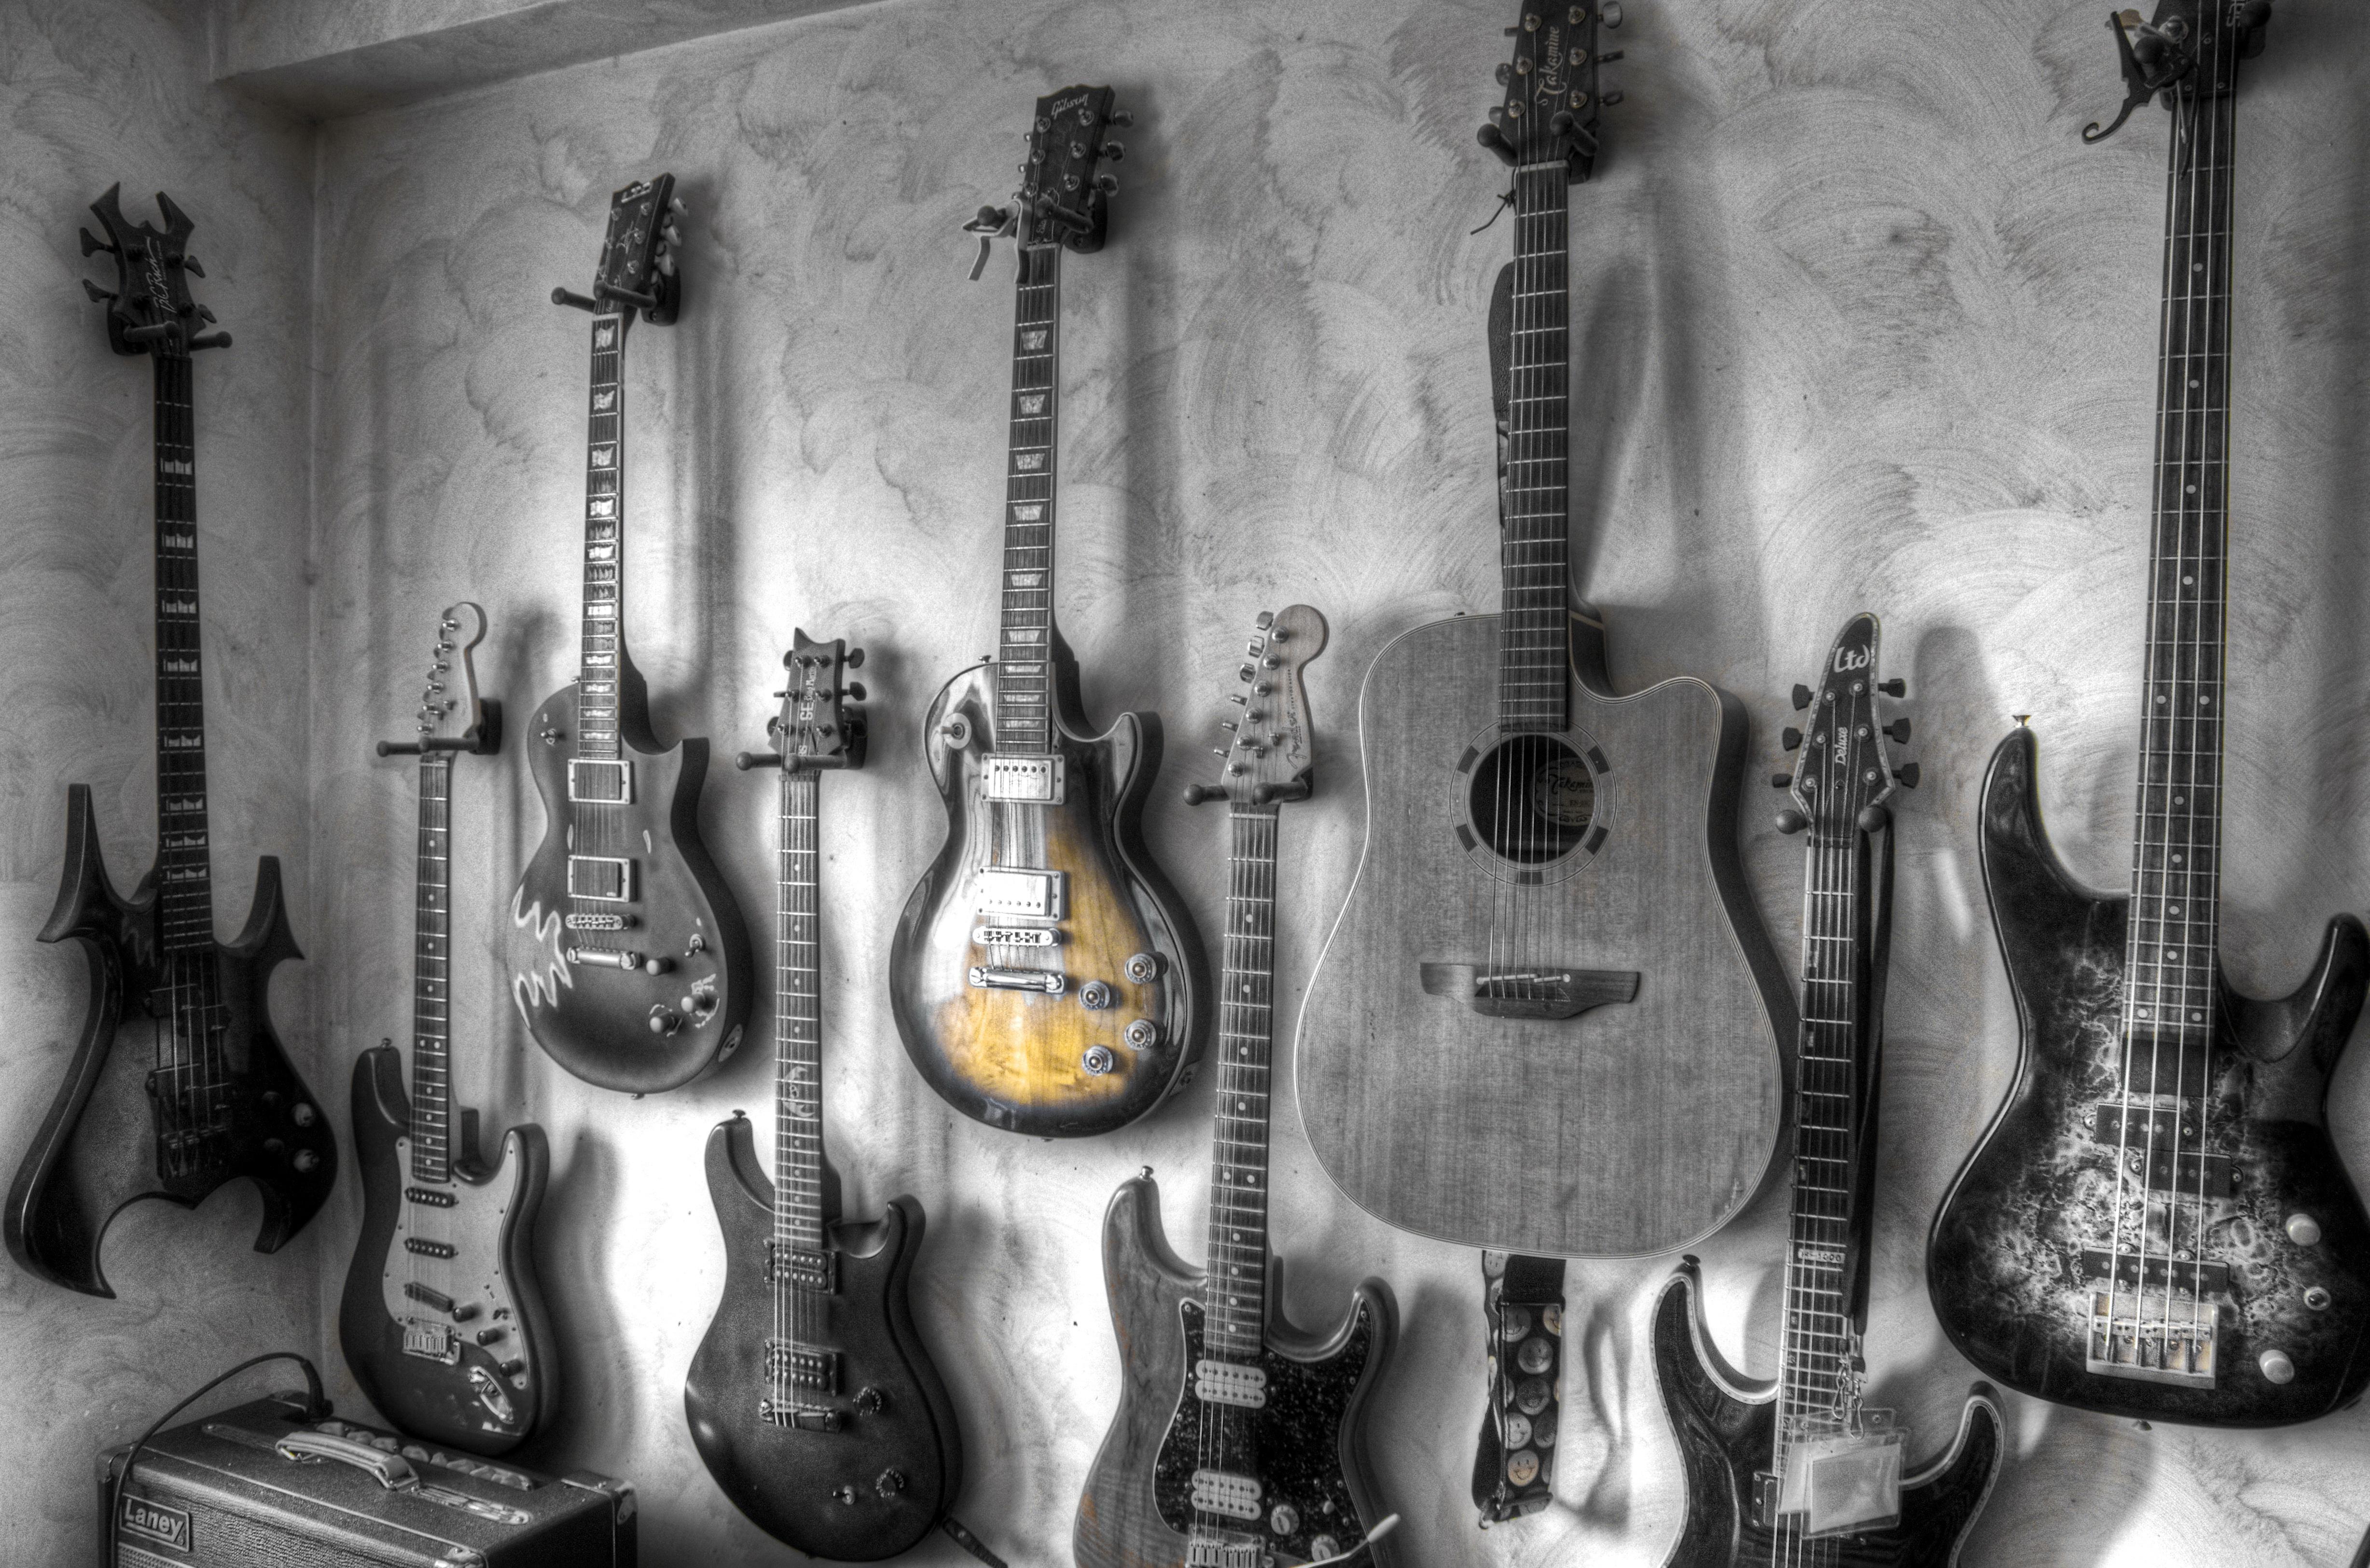 Guitarra 4k Ultra Fondo De Pantalla Hd Fondo De Escritorio 4911x3249 Id 748579 Wallpaper Abyss